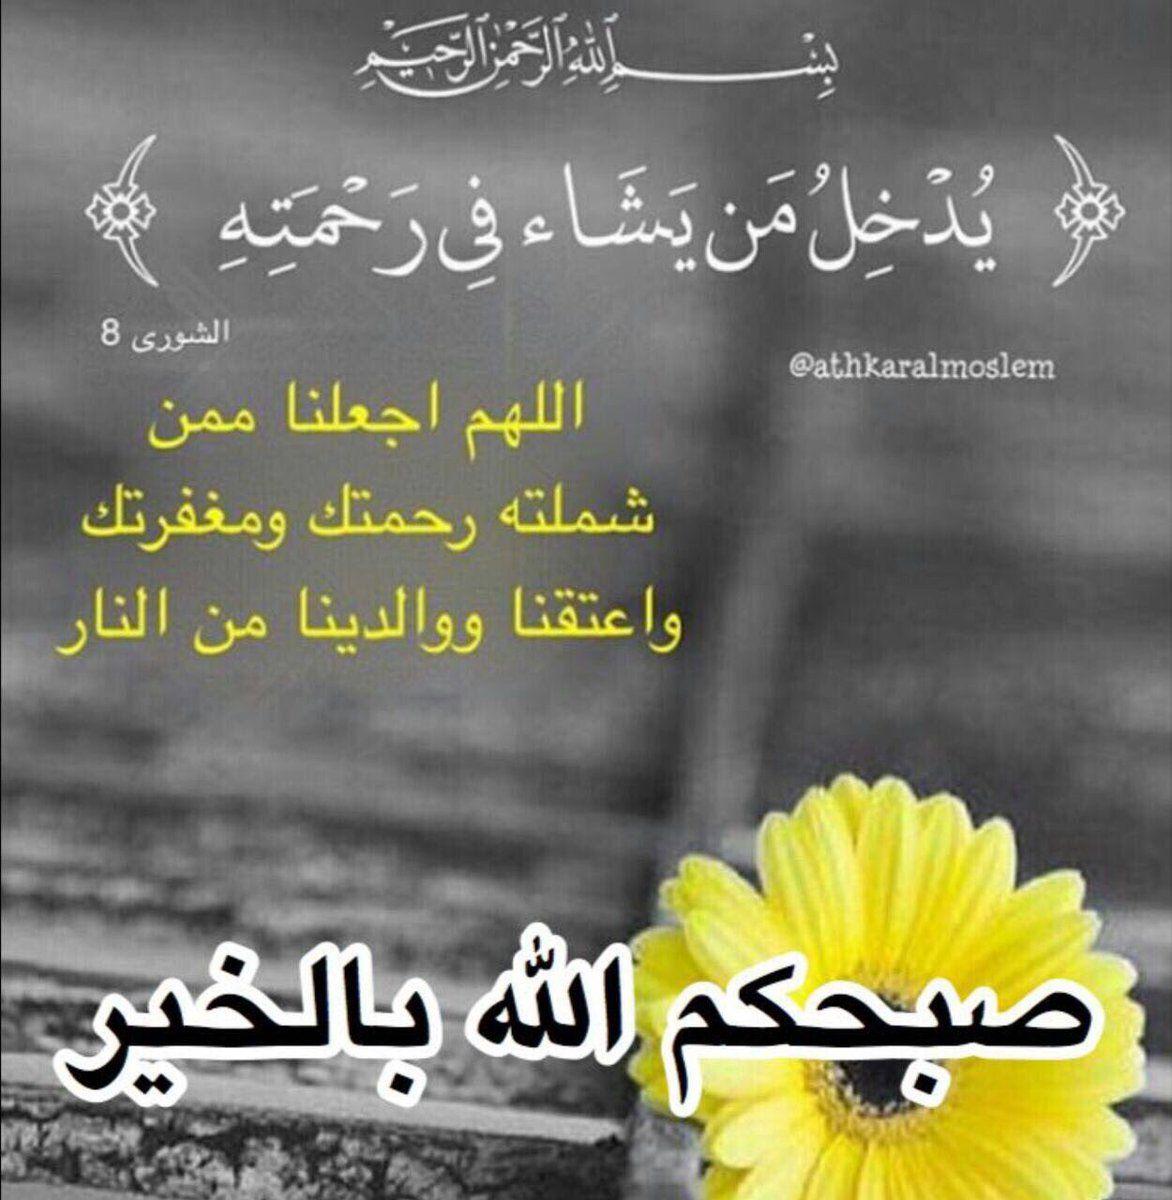 Hala Albathani Mohamyaq8 Twitter Good Morning Messages Good Morning Quotes Good Morning Arabic